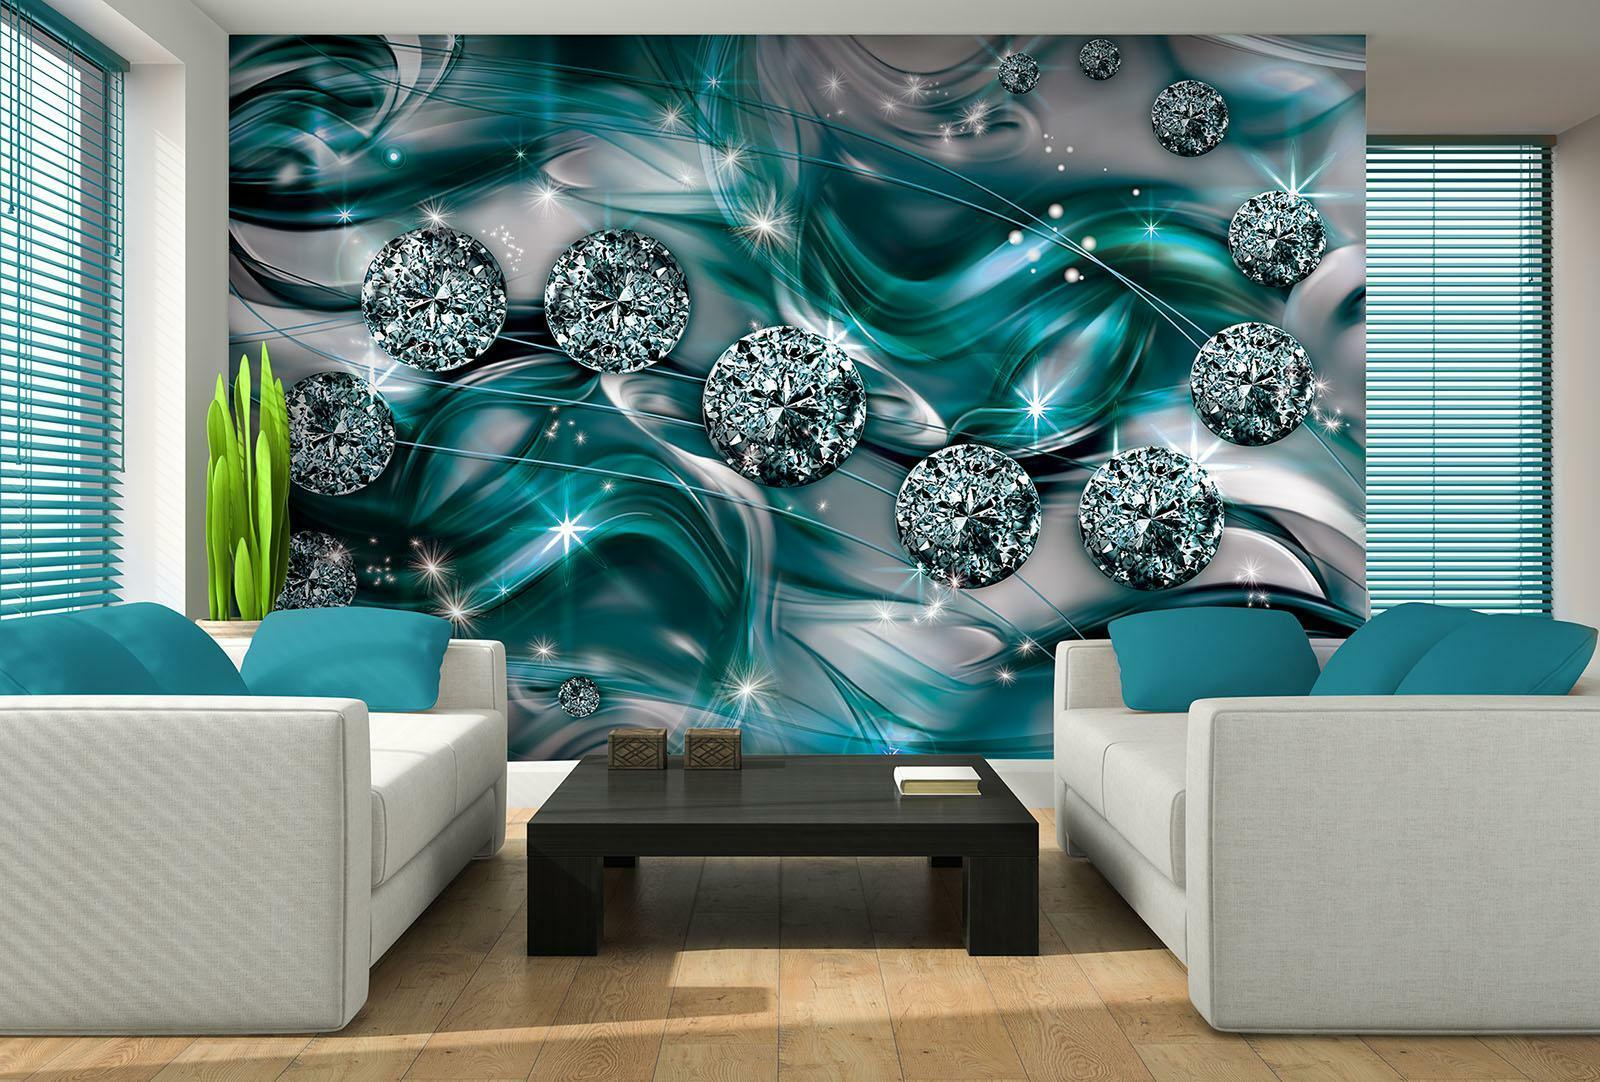 Vließ Fototapete Tapete Wandbild Diamant Abstraktion 310578_VEMVT